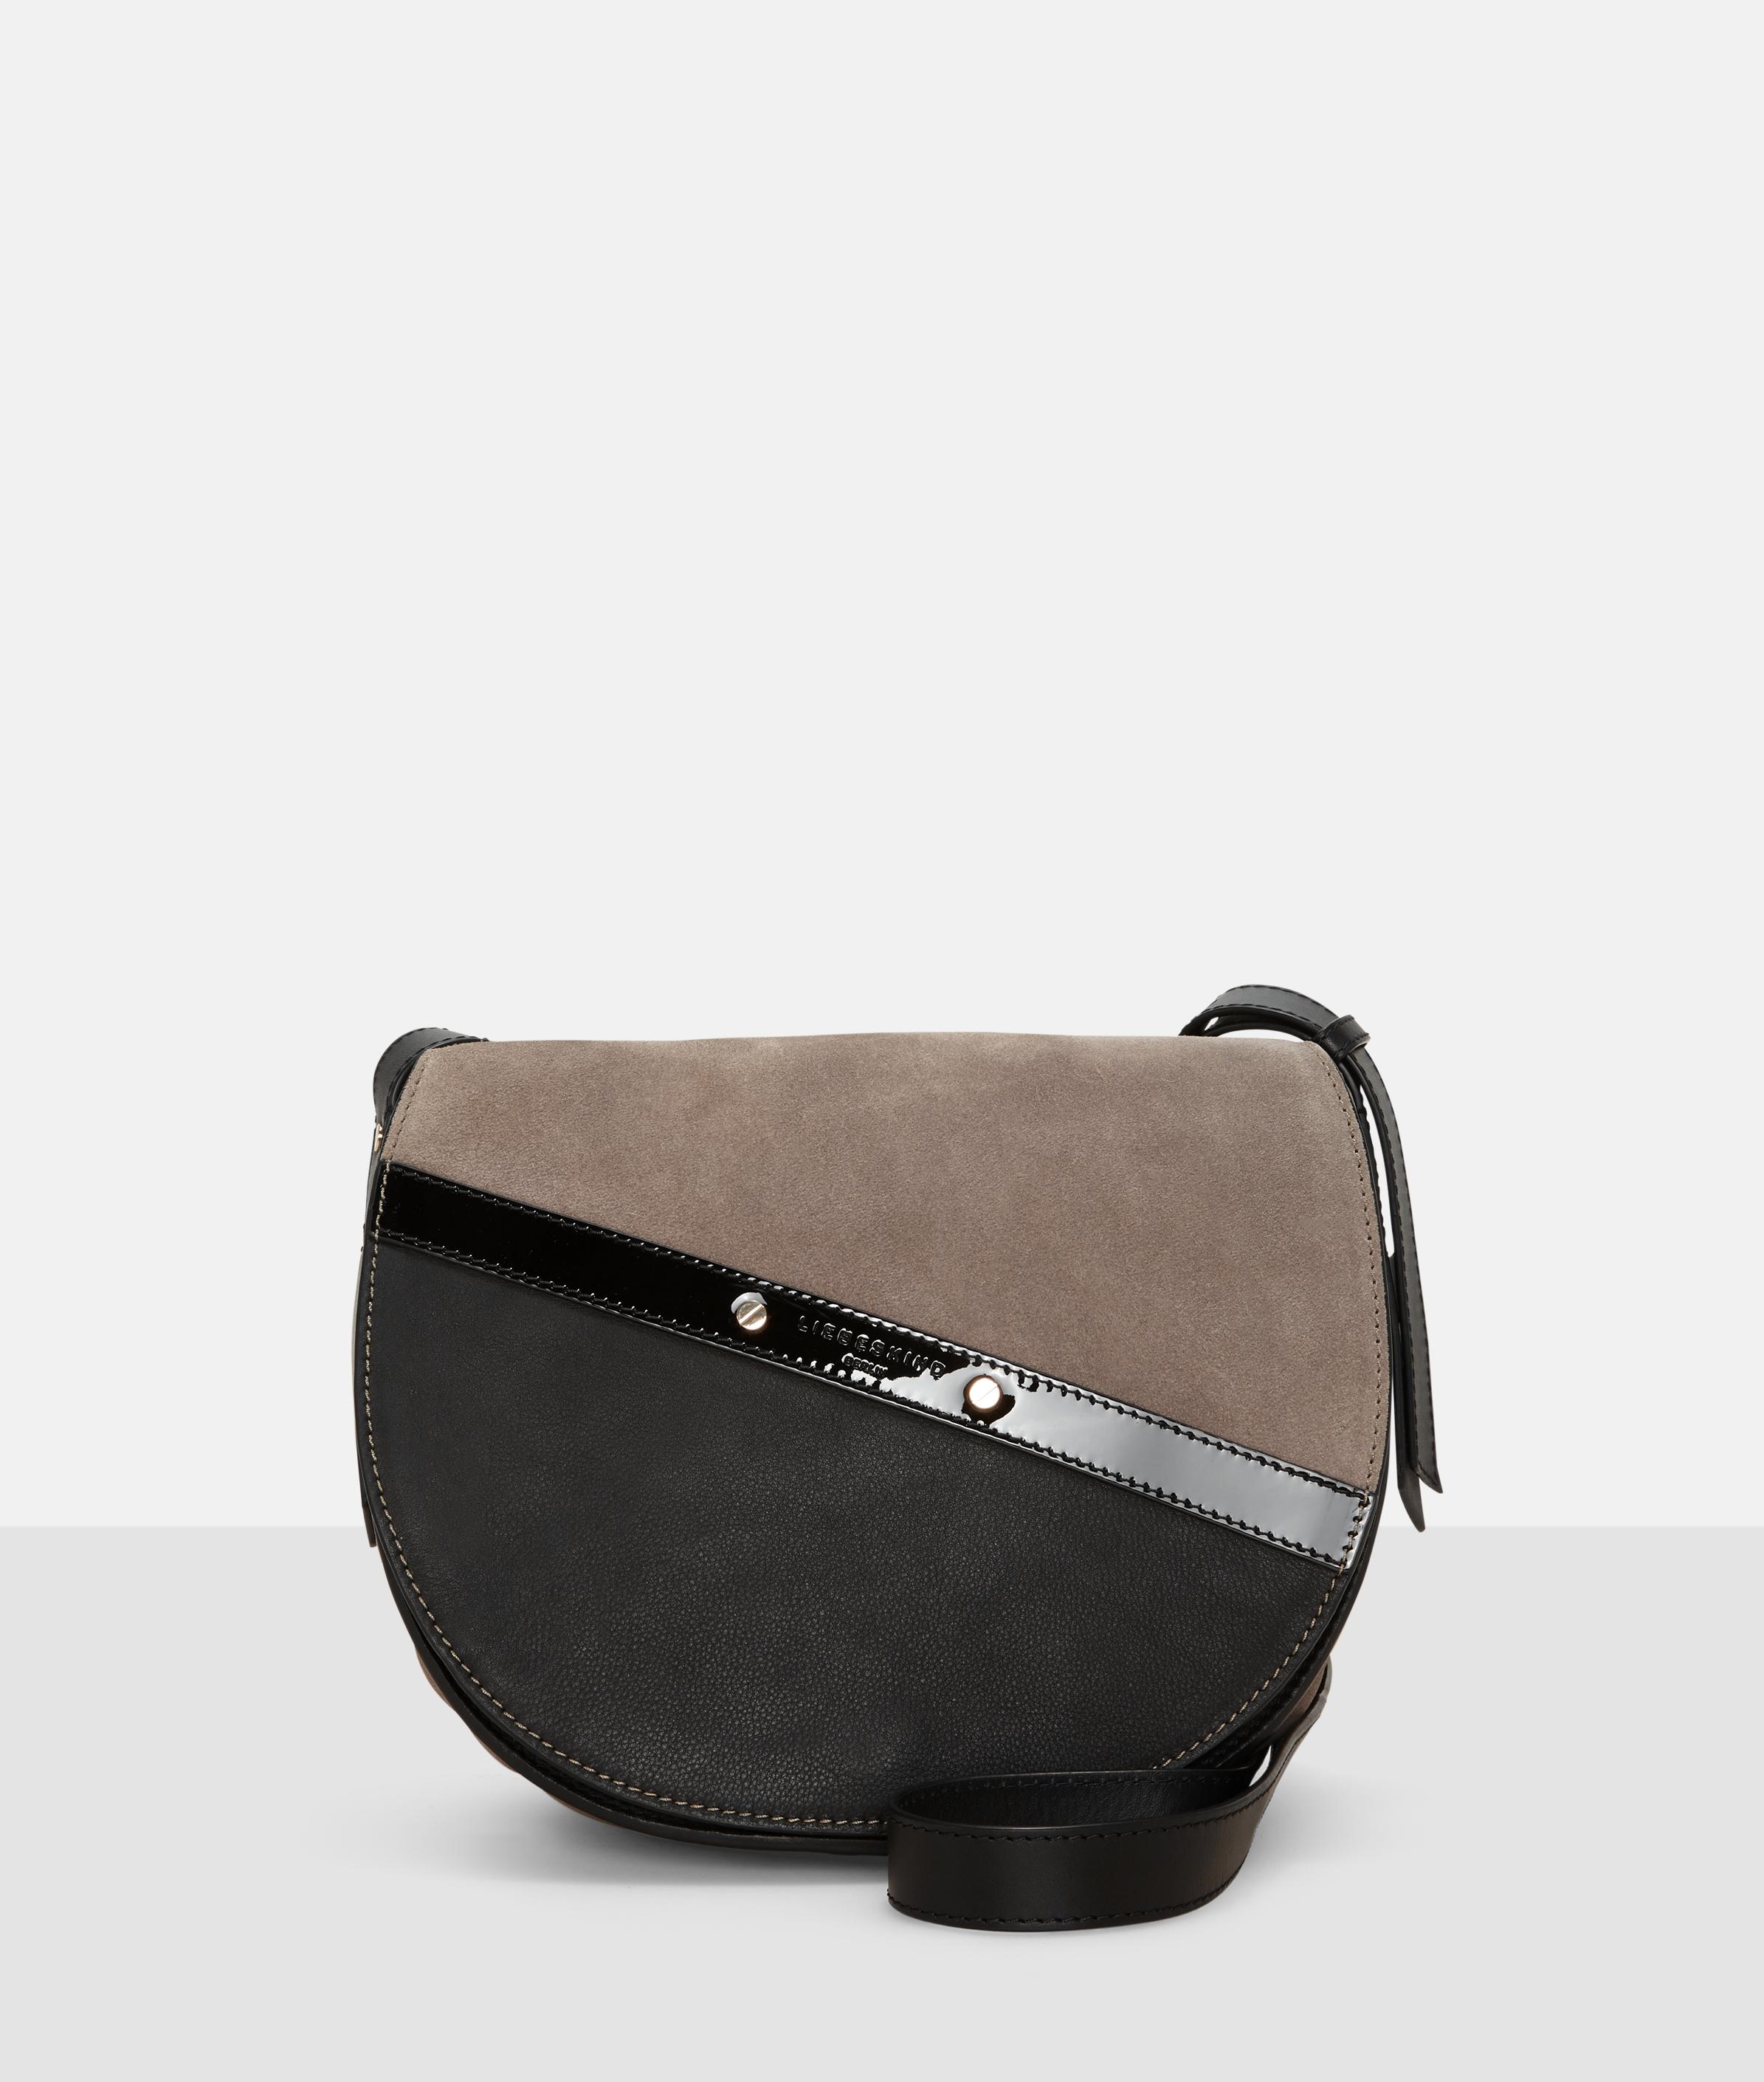 Berlin Tasche Helmet Patent Crossbody Bag M, Grau/Schwarz